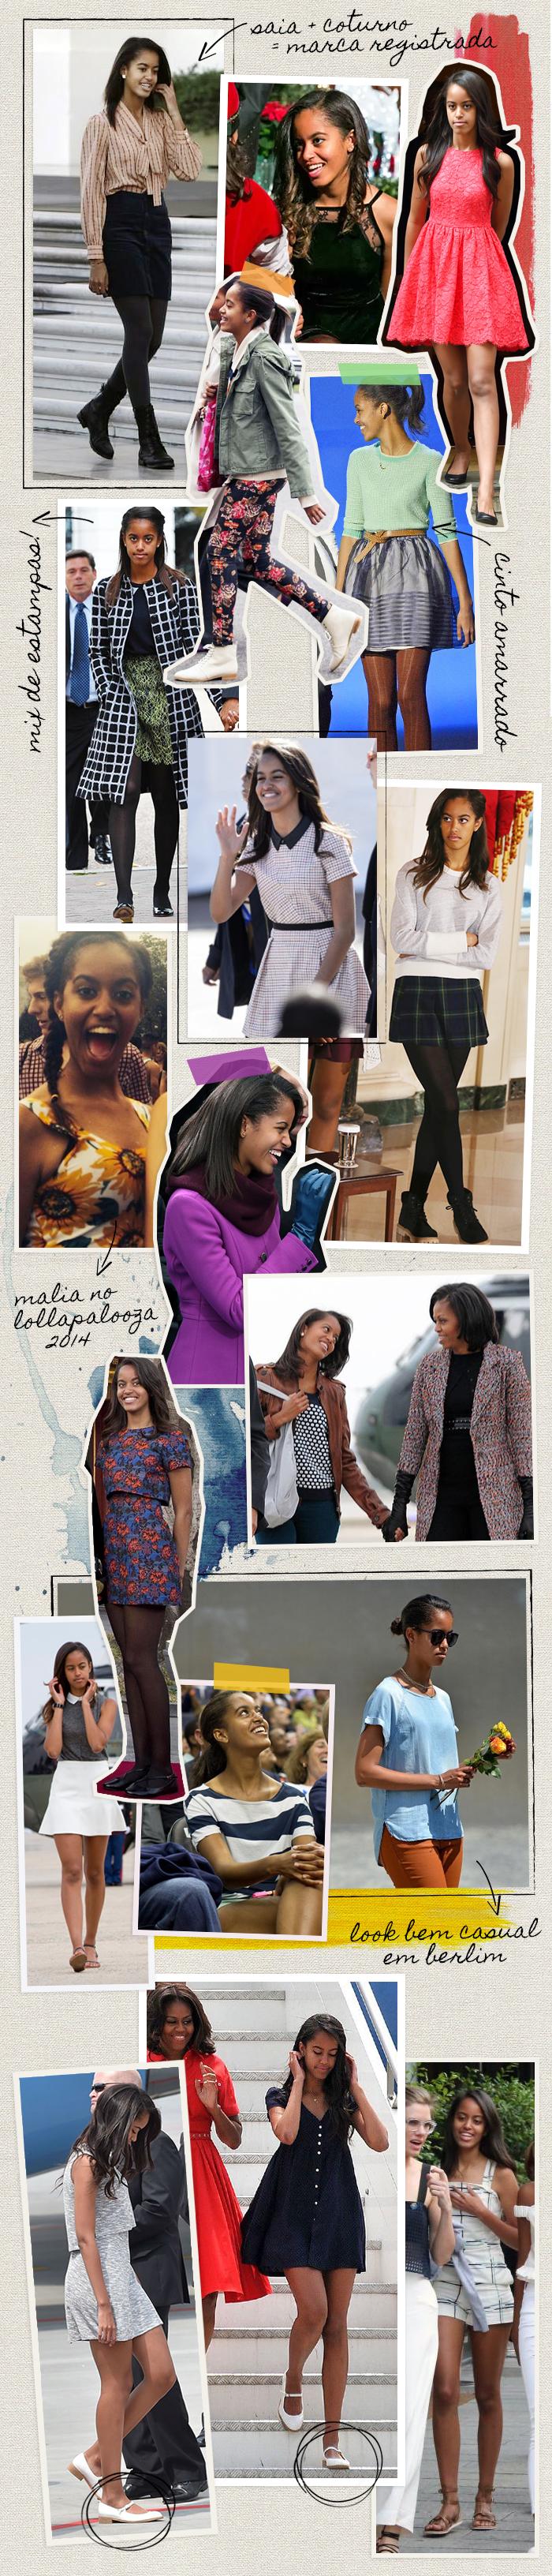 Malia-Obama-Style